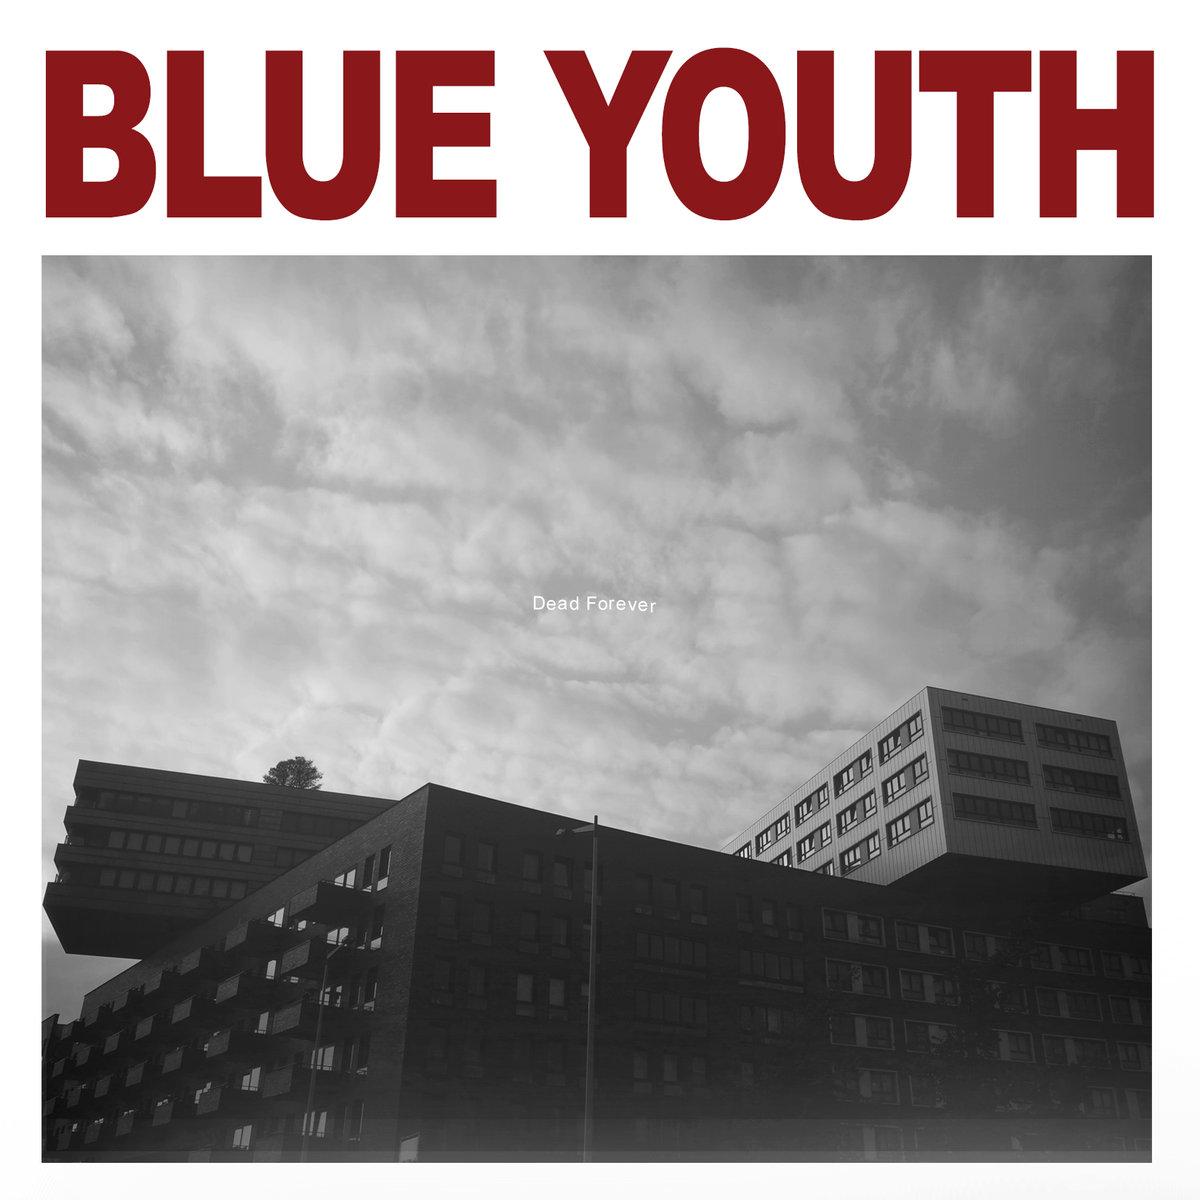 Blue Youth - Dead Forever  Artwork by Michael Dawson